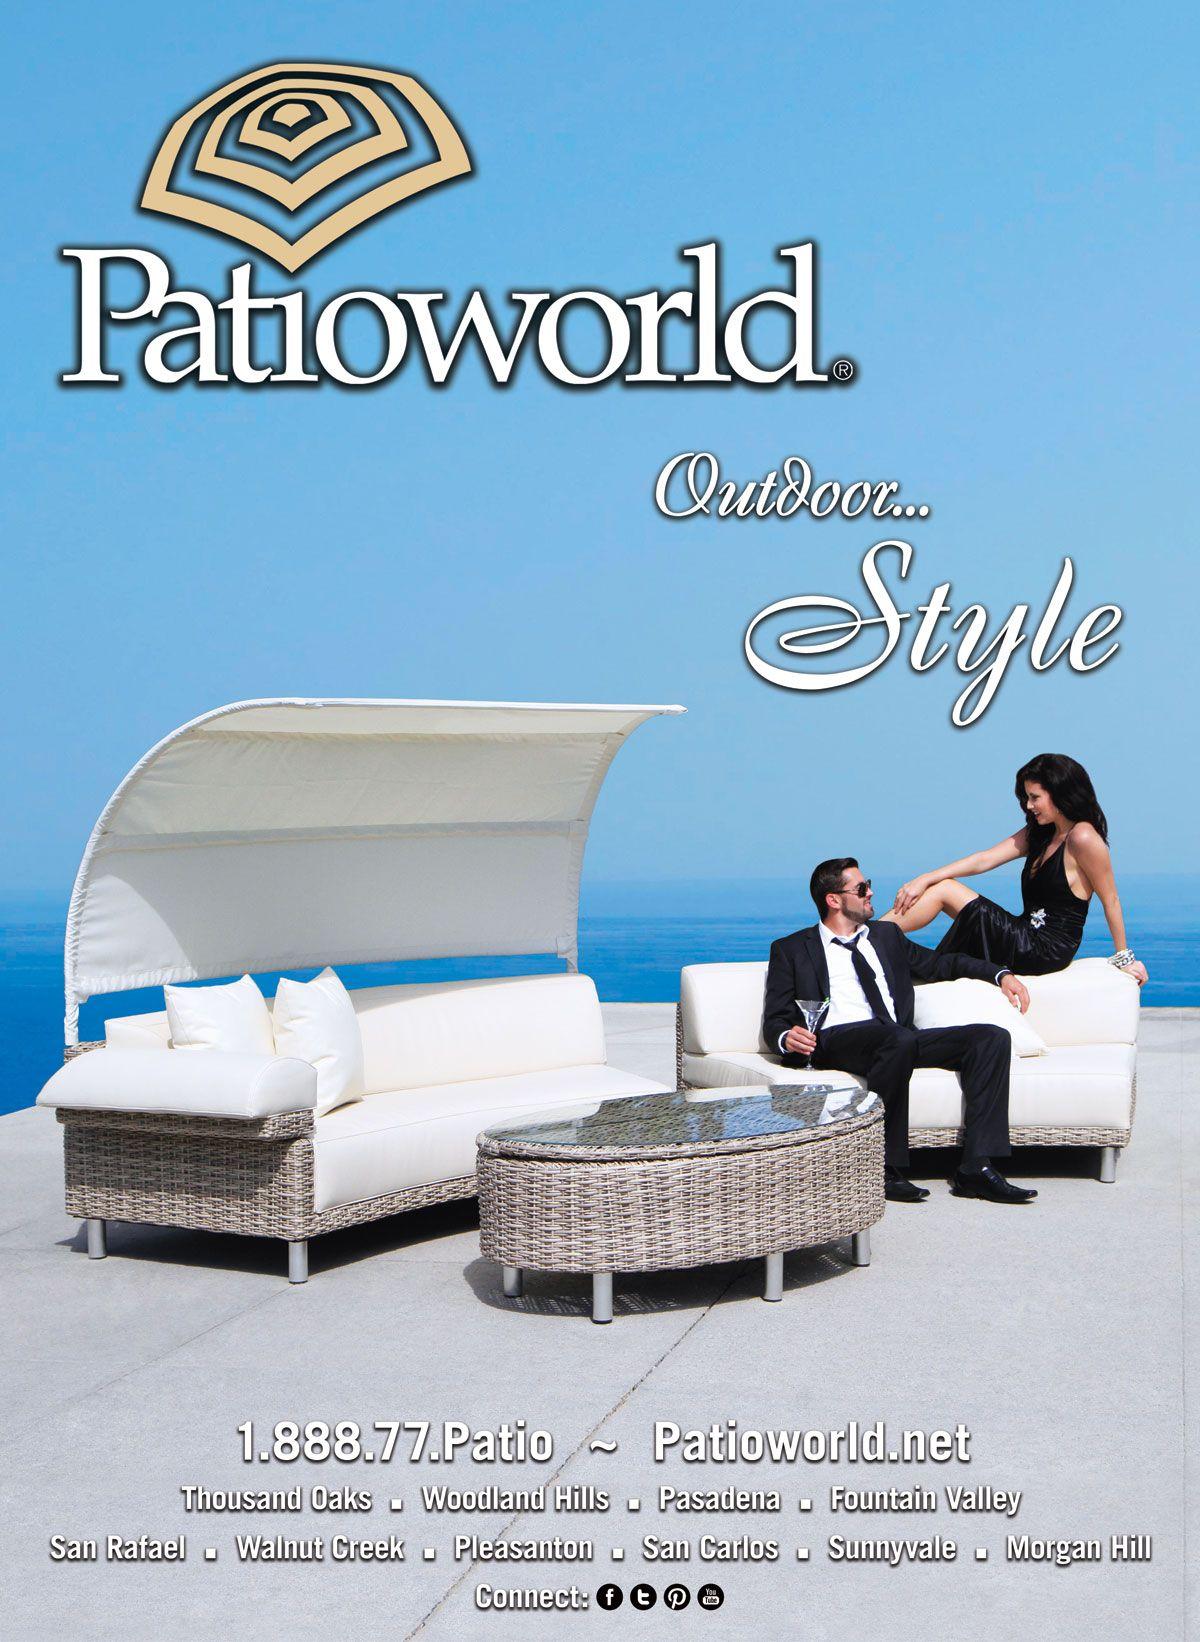 Publication Gorgeous Magazine Issue May June 2014 Full